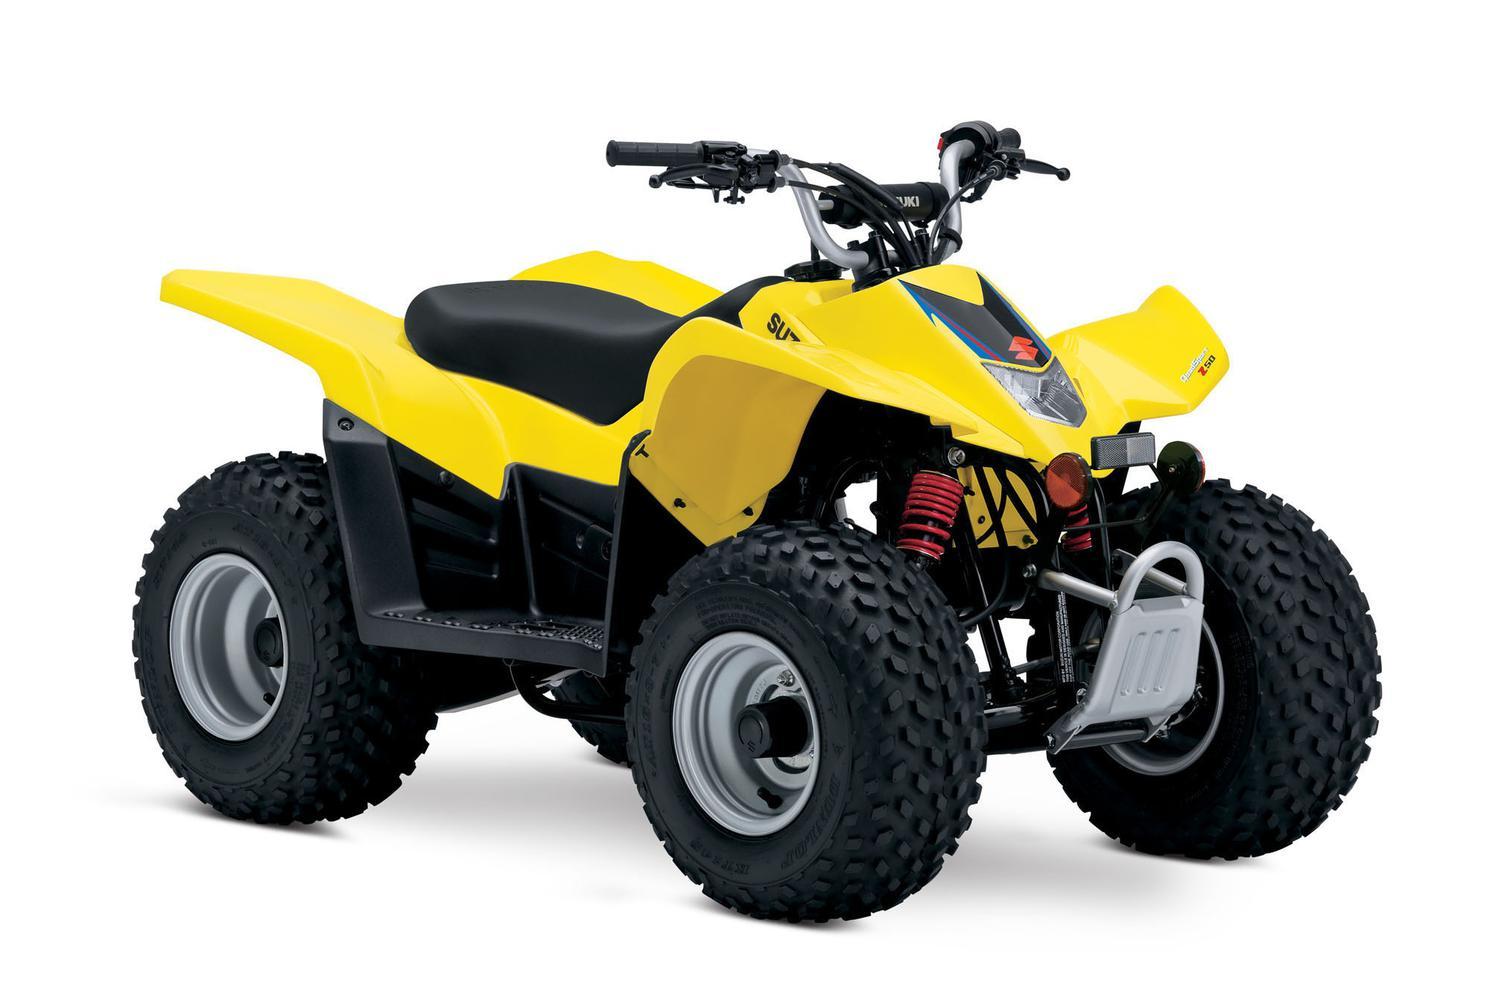 Suzuki QuadSport Z50 Jaune 2021